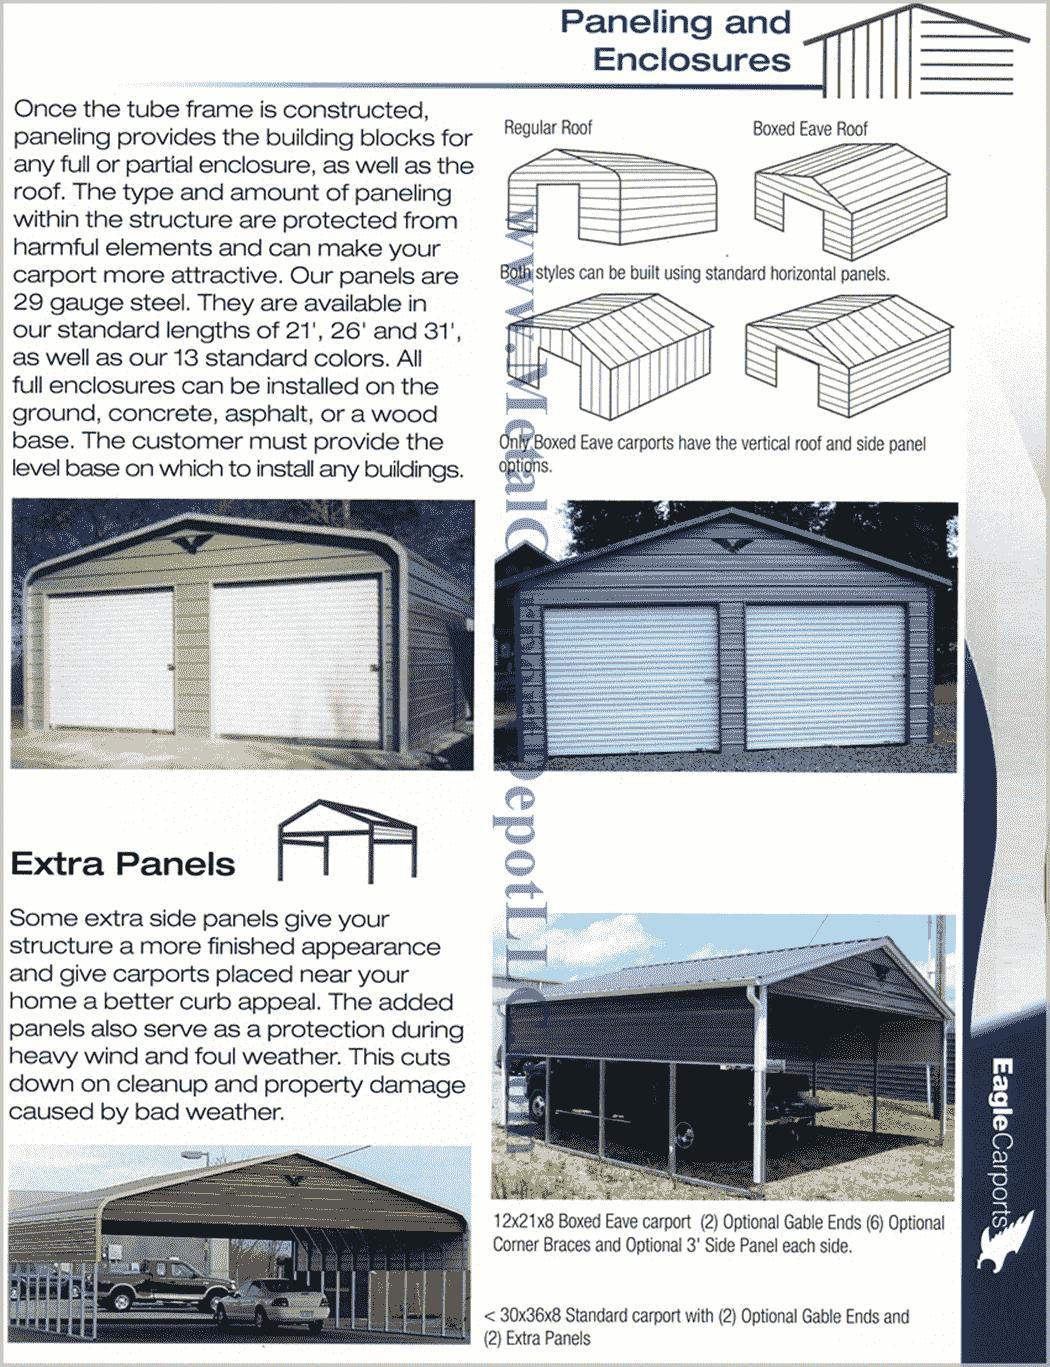 Metal Carport & Building Paneling & Enclosure Information min